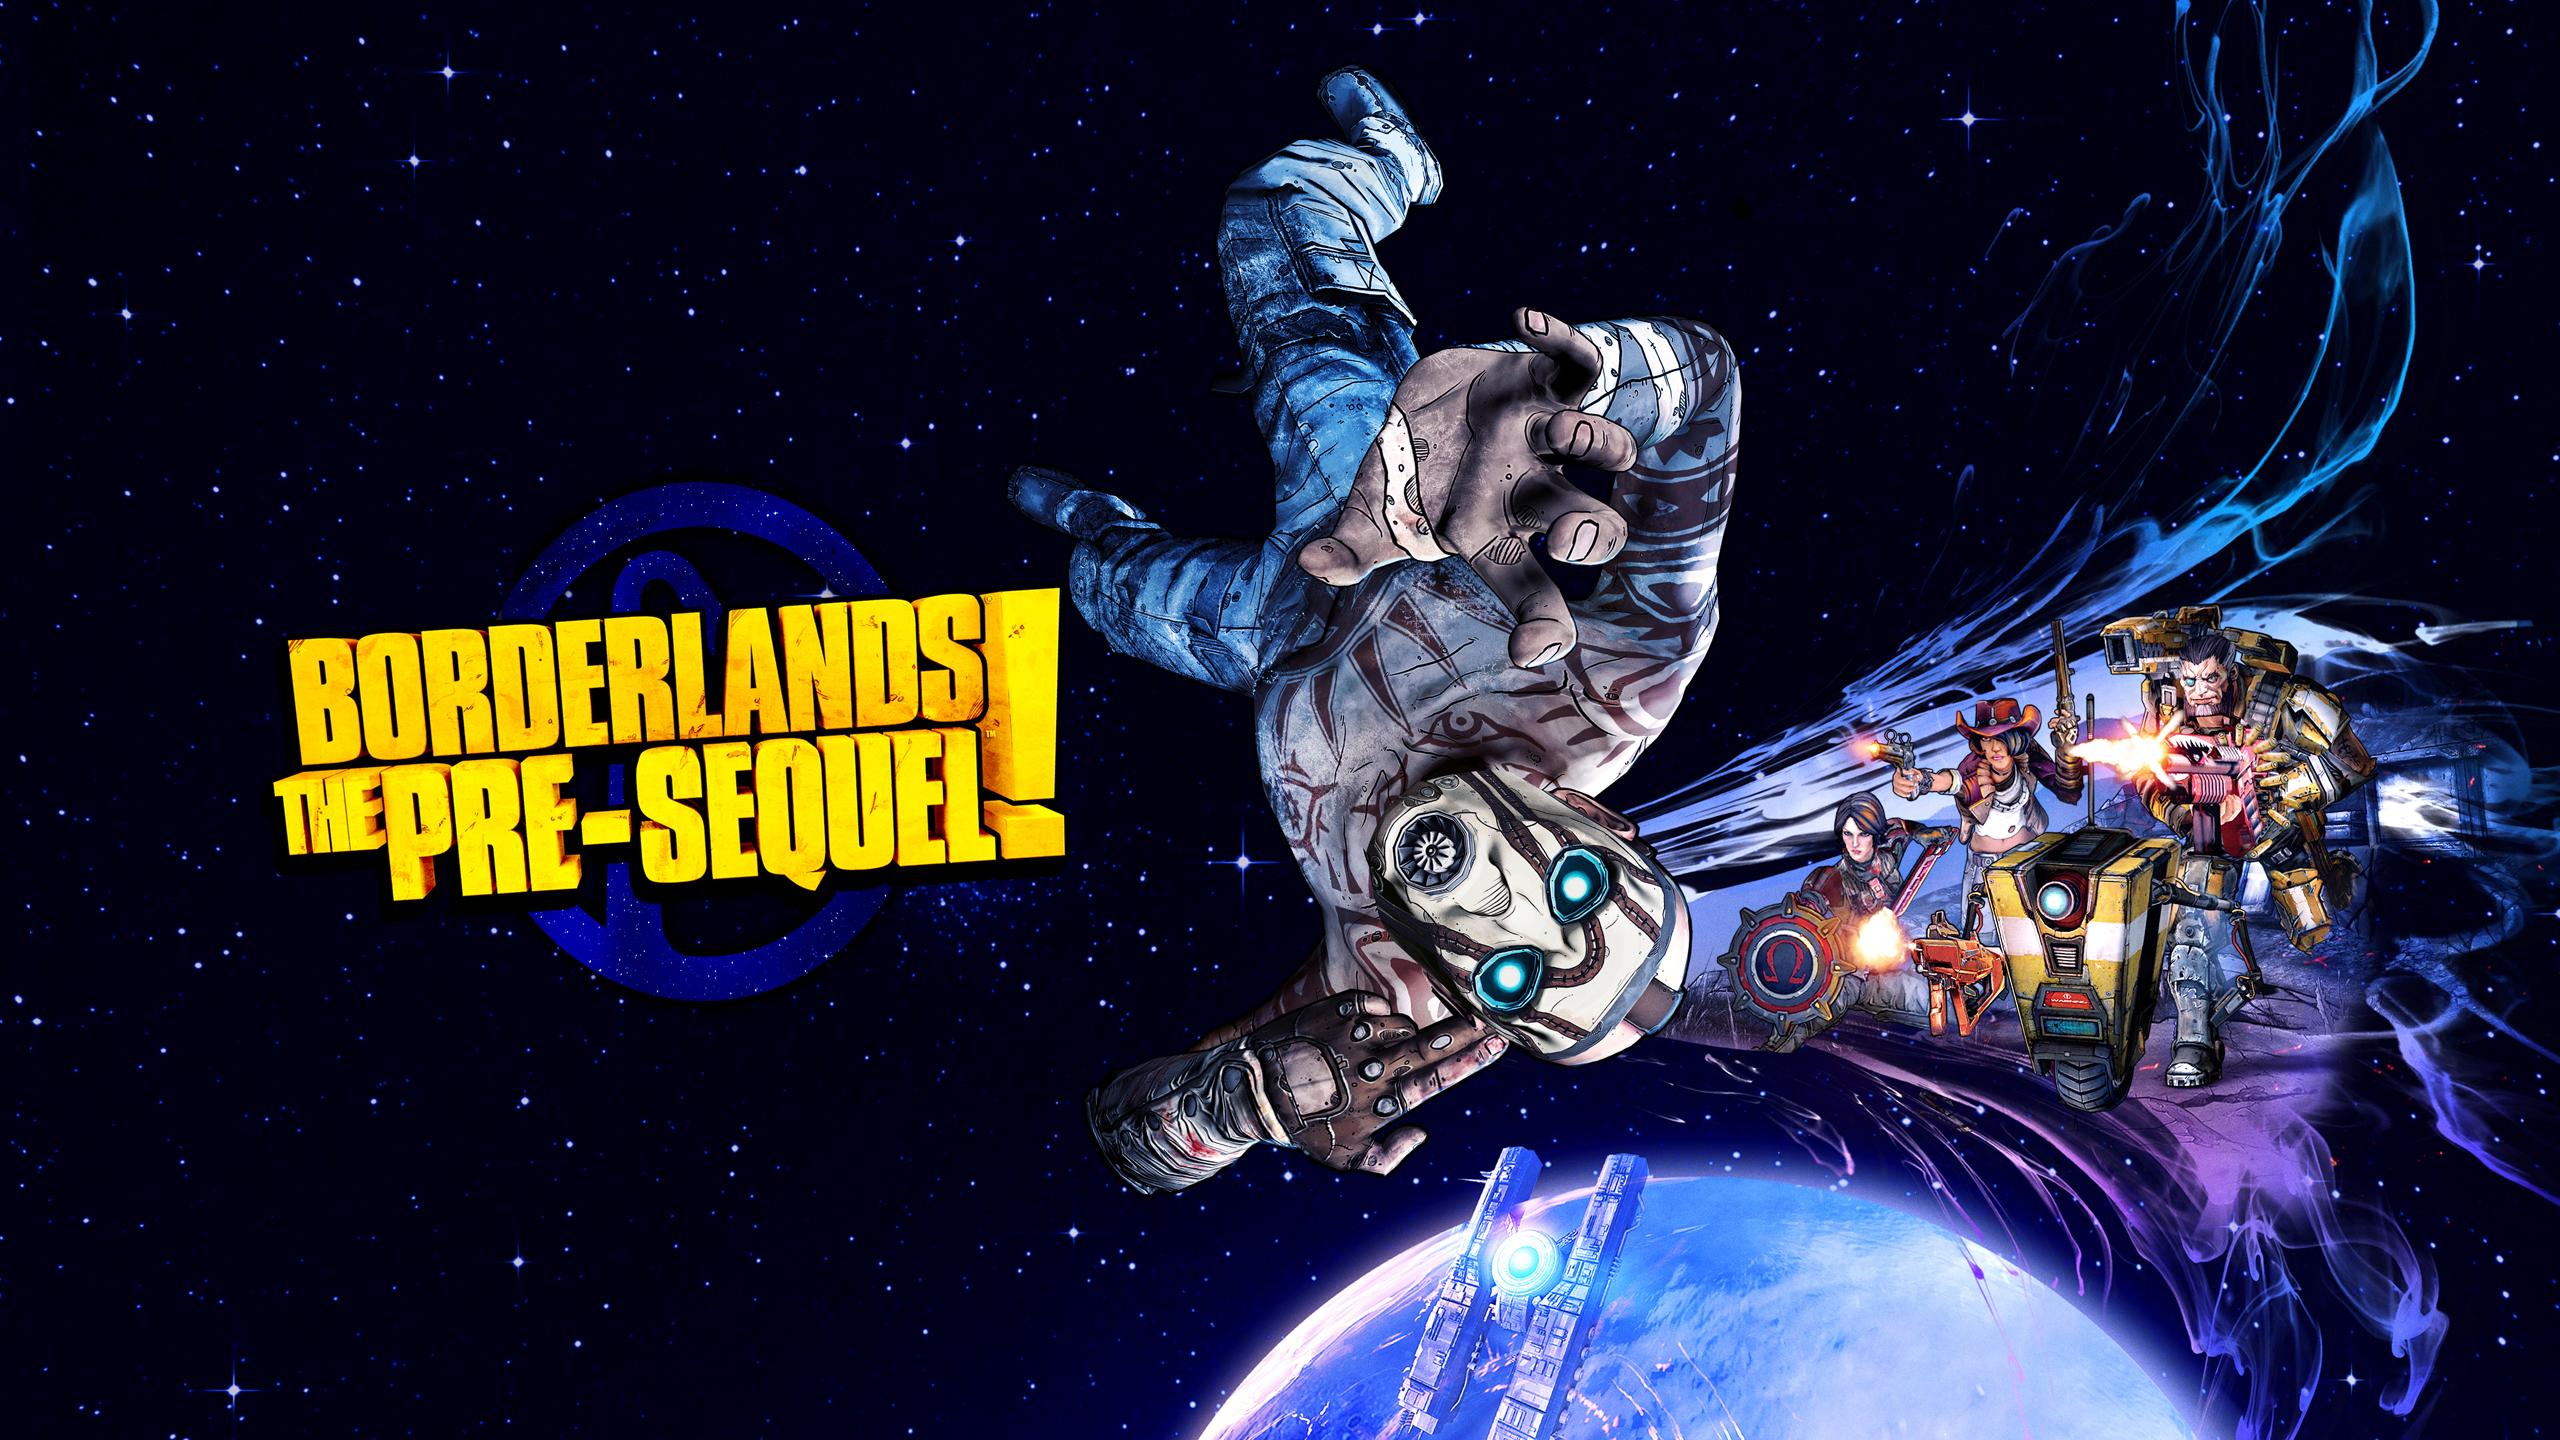 Borderlands-The-Pre-Sequel